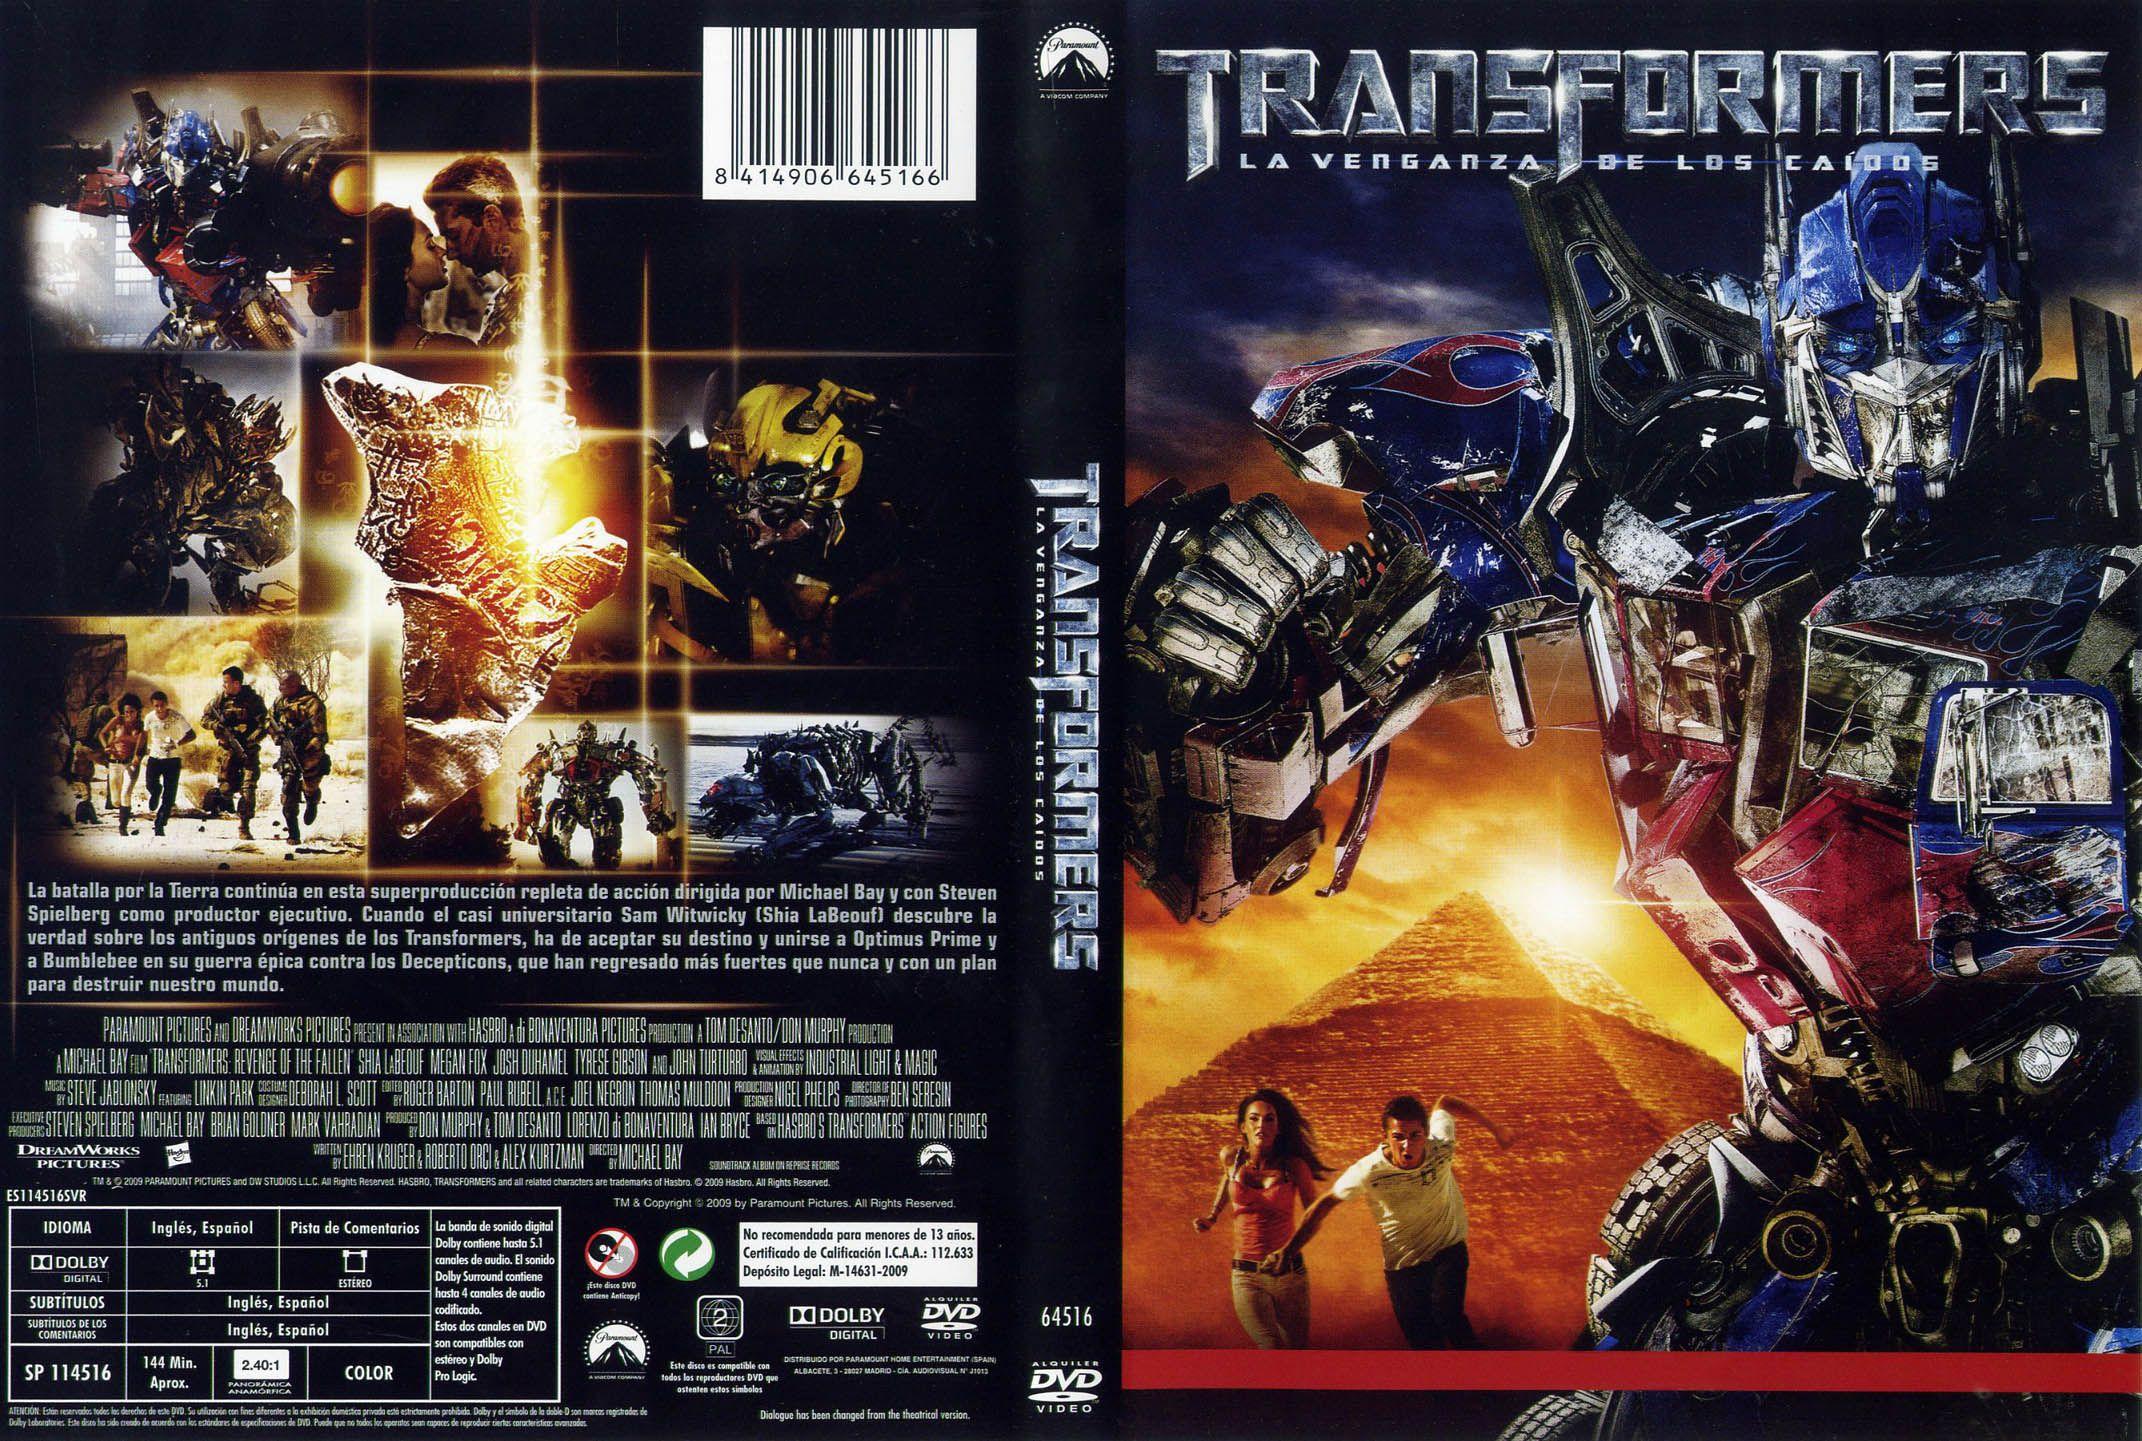 Caratula Dvd Transformers 1 Buscar Con Google Portadas De Películas Transformers Dvd